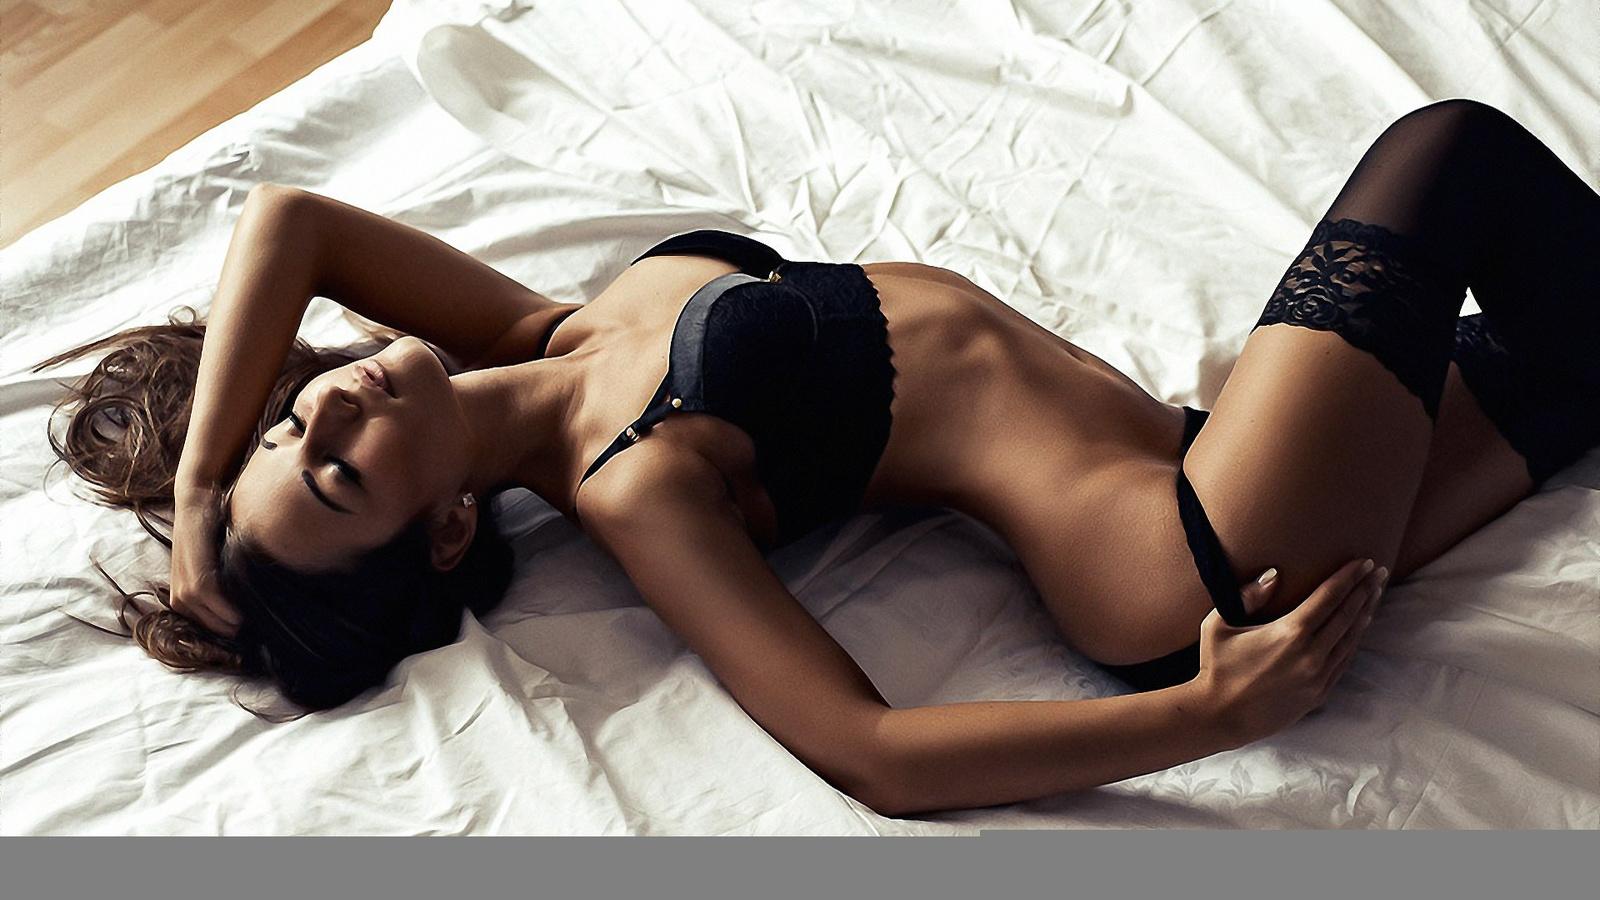 lesbian reshma nude pic